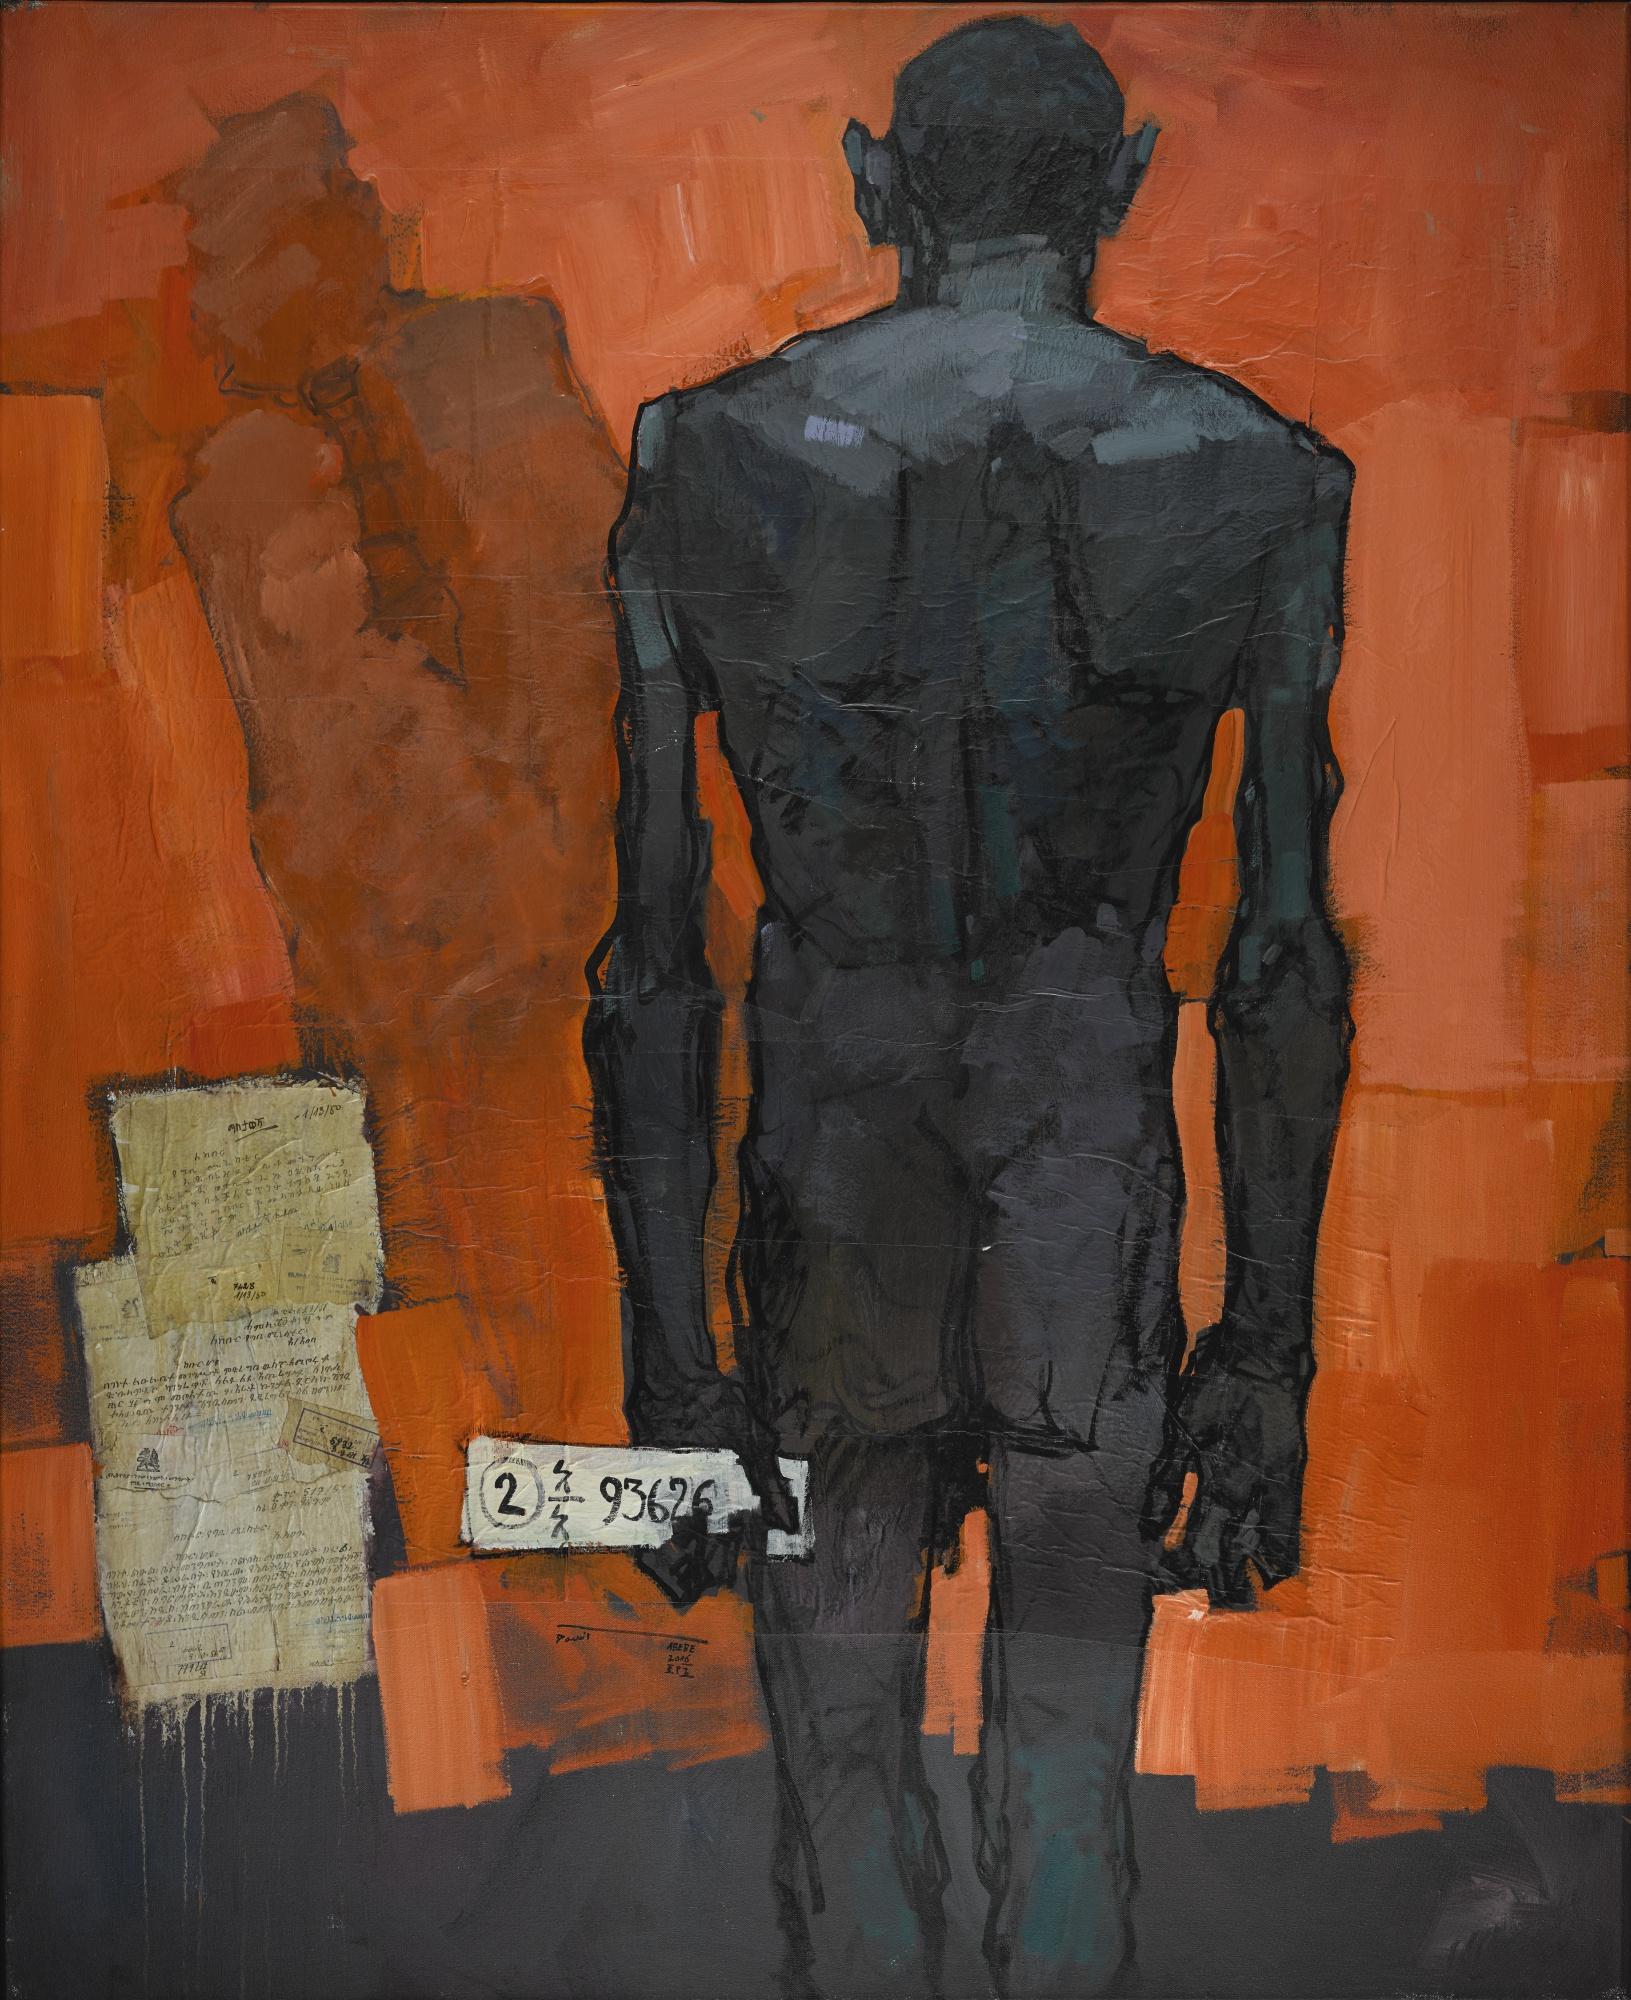 Dawit Abebe,  No.2 Background 5 , 2014, courtesy of Kristin Hjellegjerdge Gallery